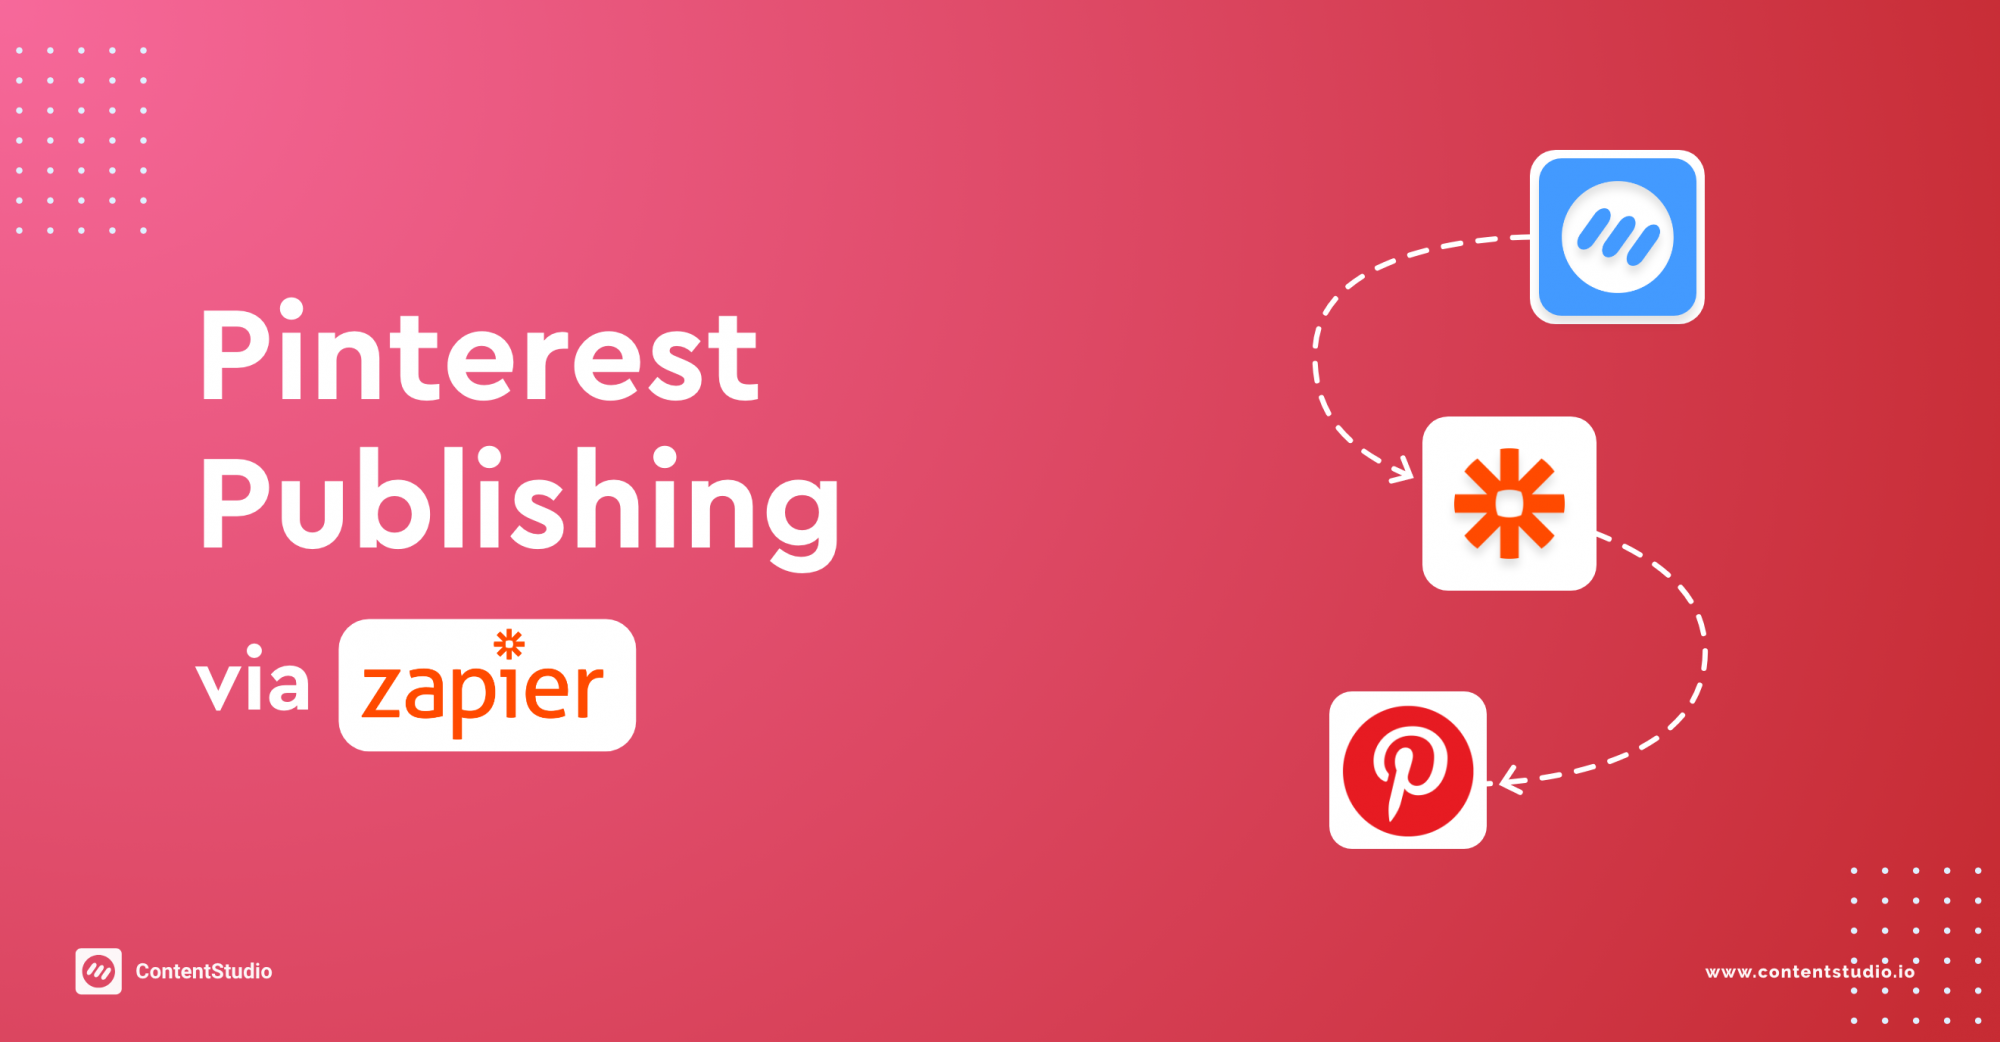 Pinterest Publishing